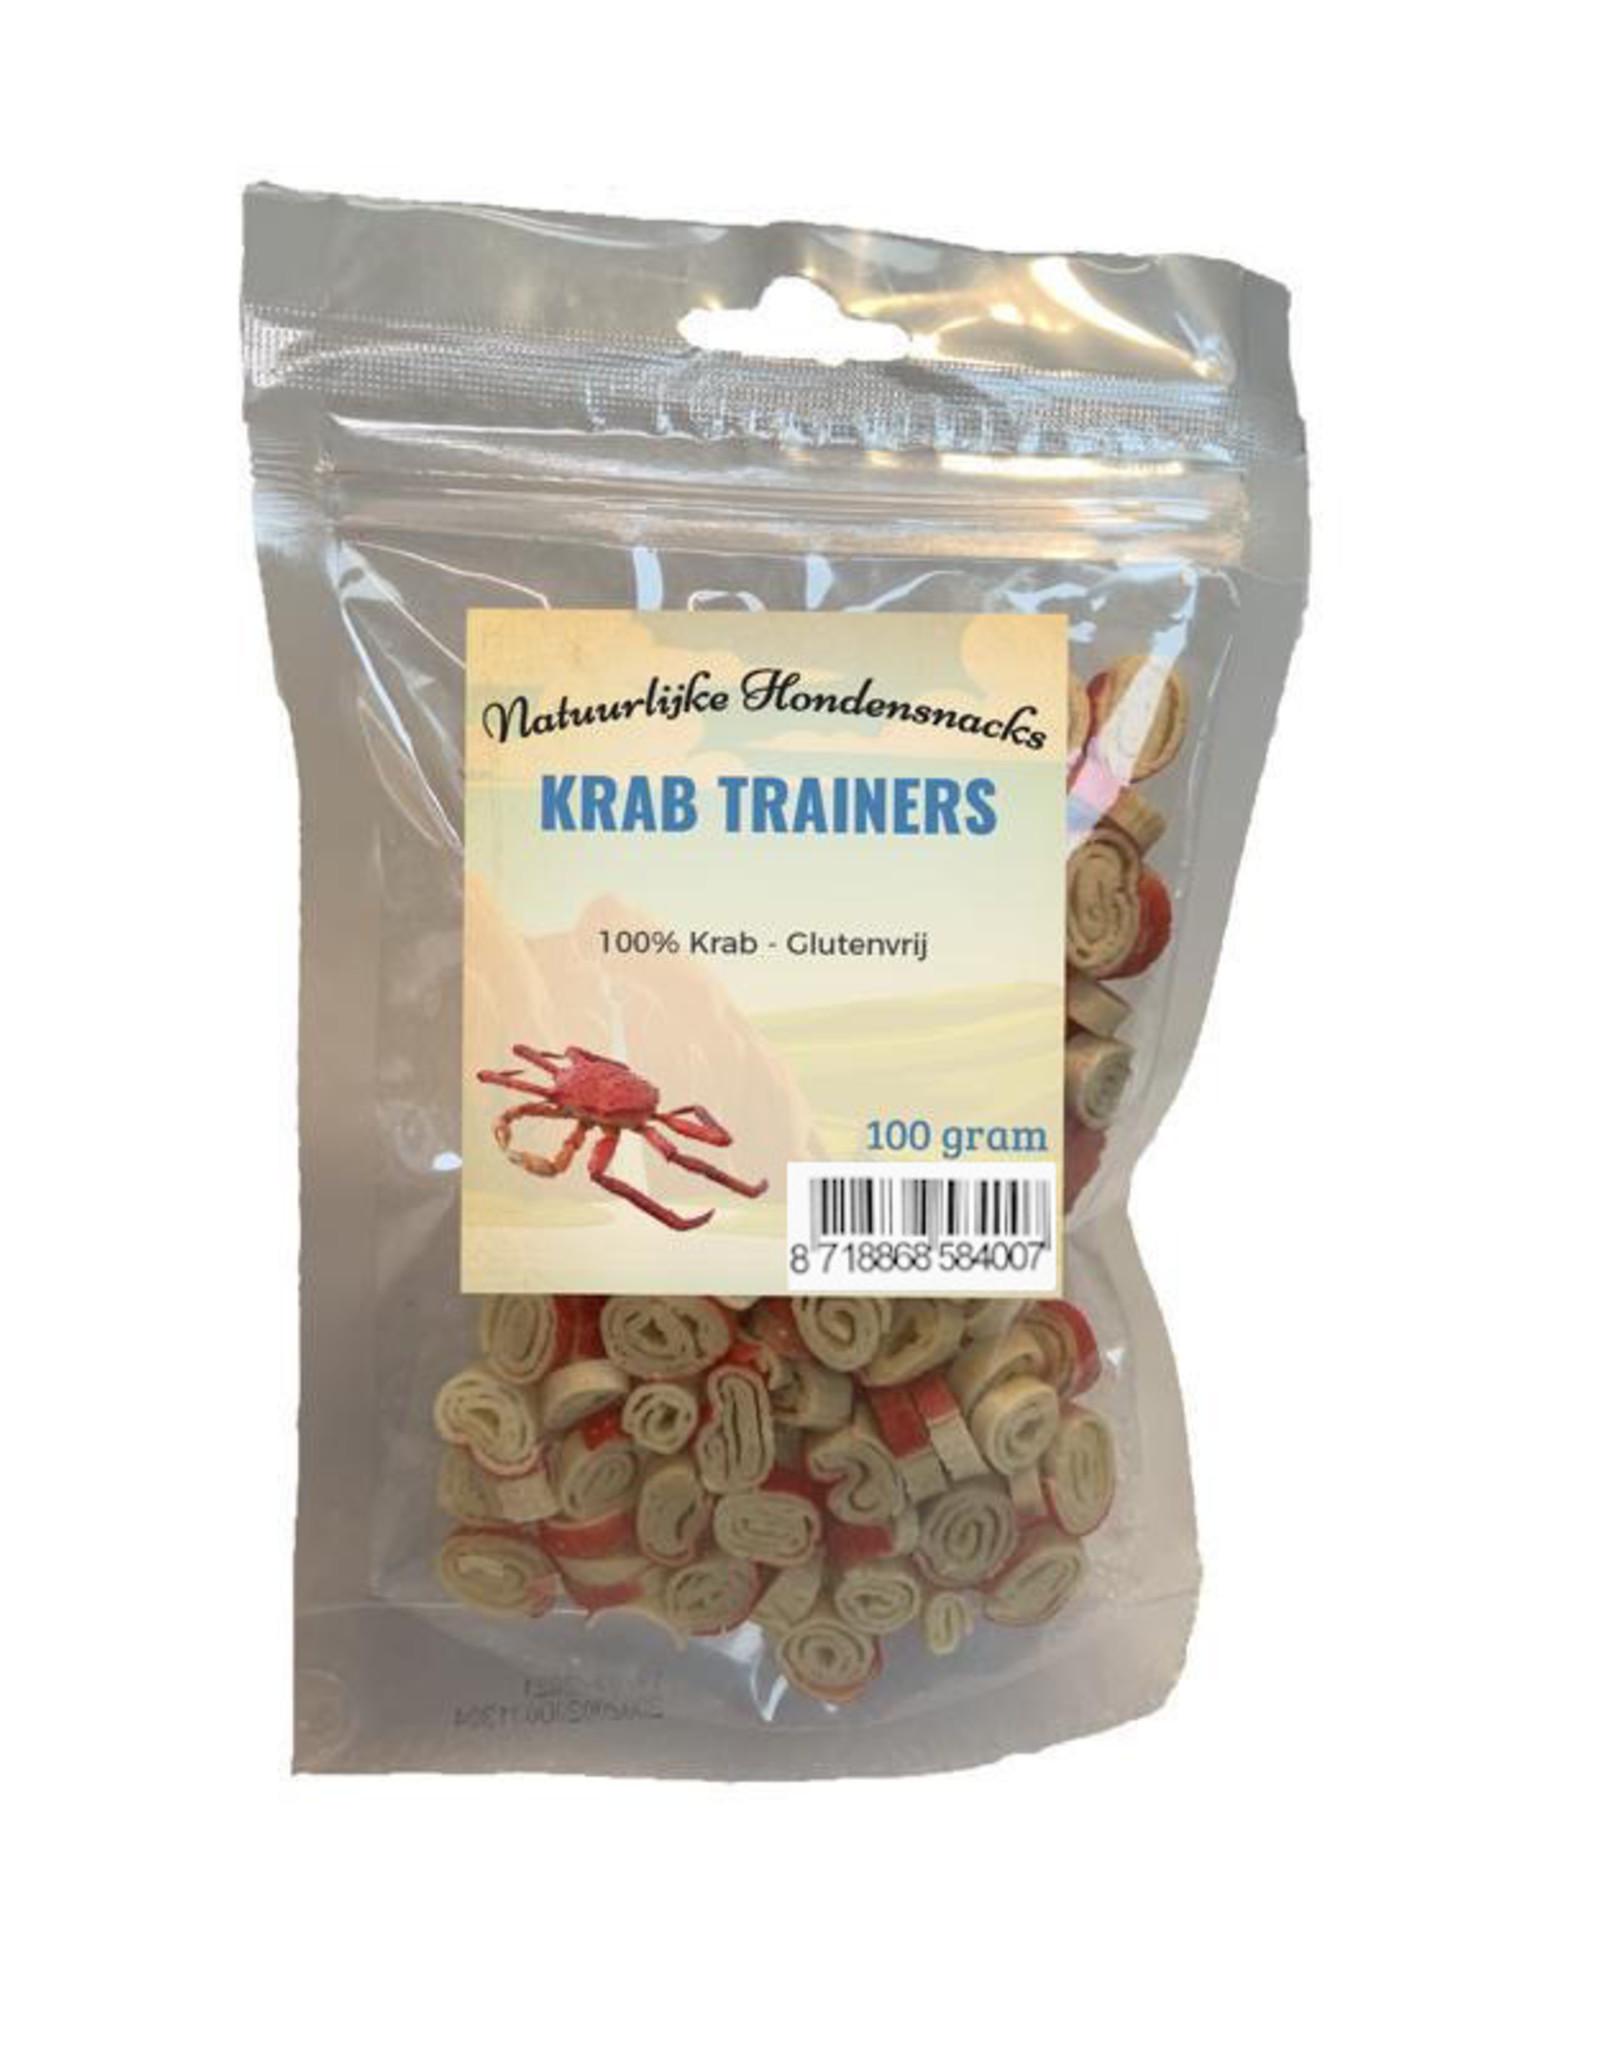 Lamphen Krab trainers 100 gram